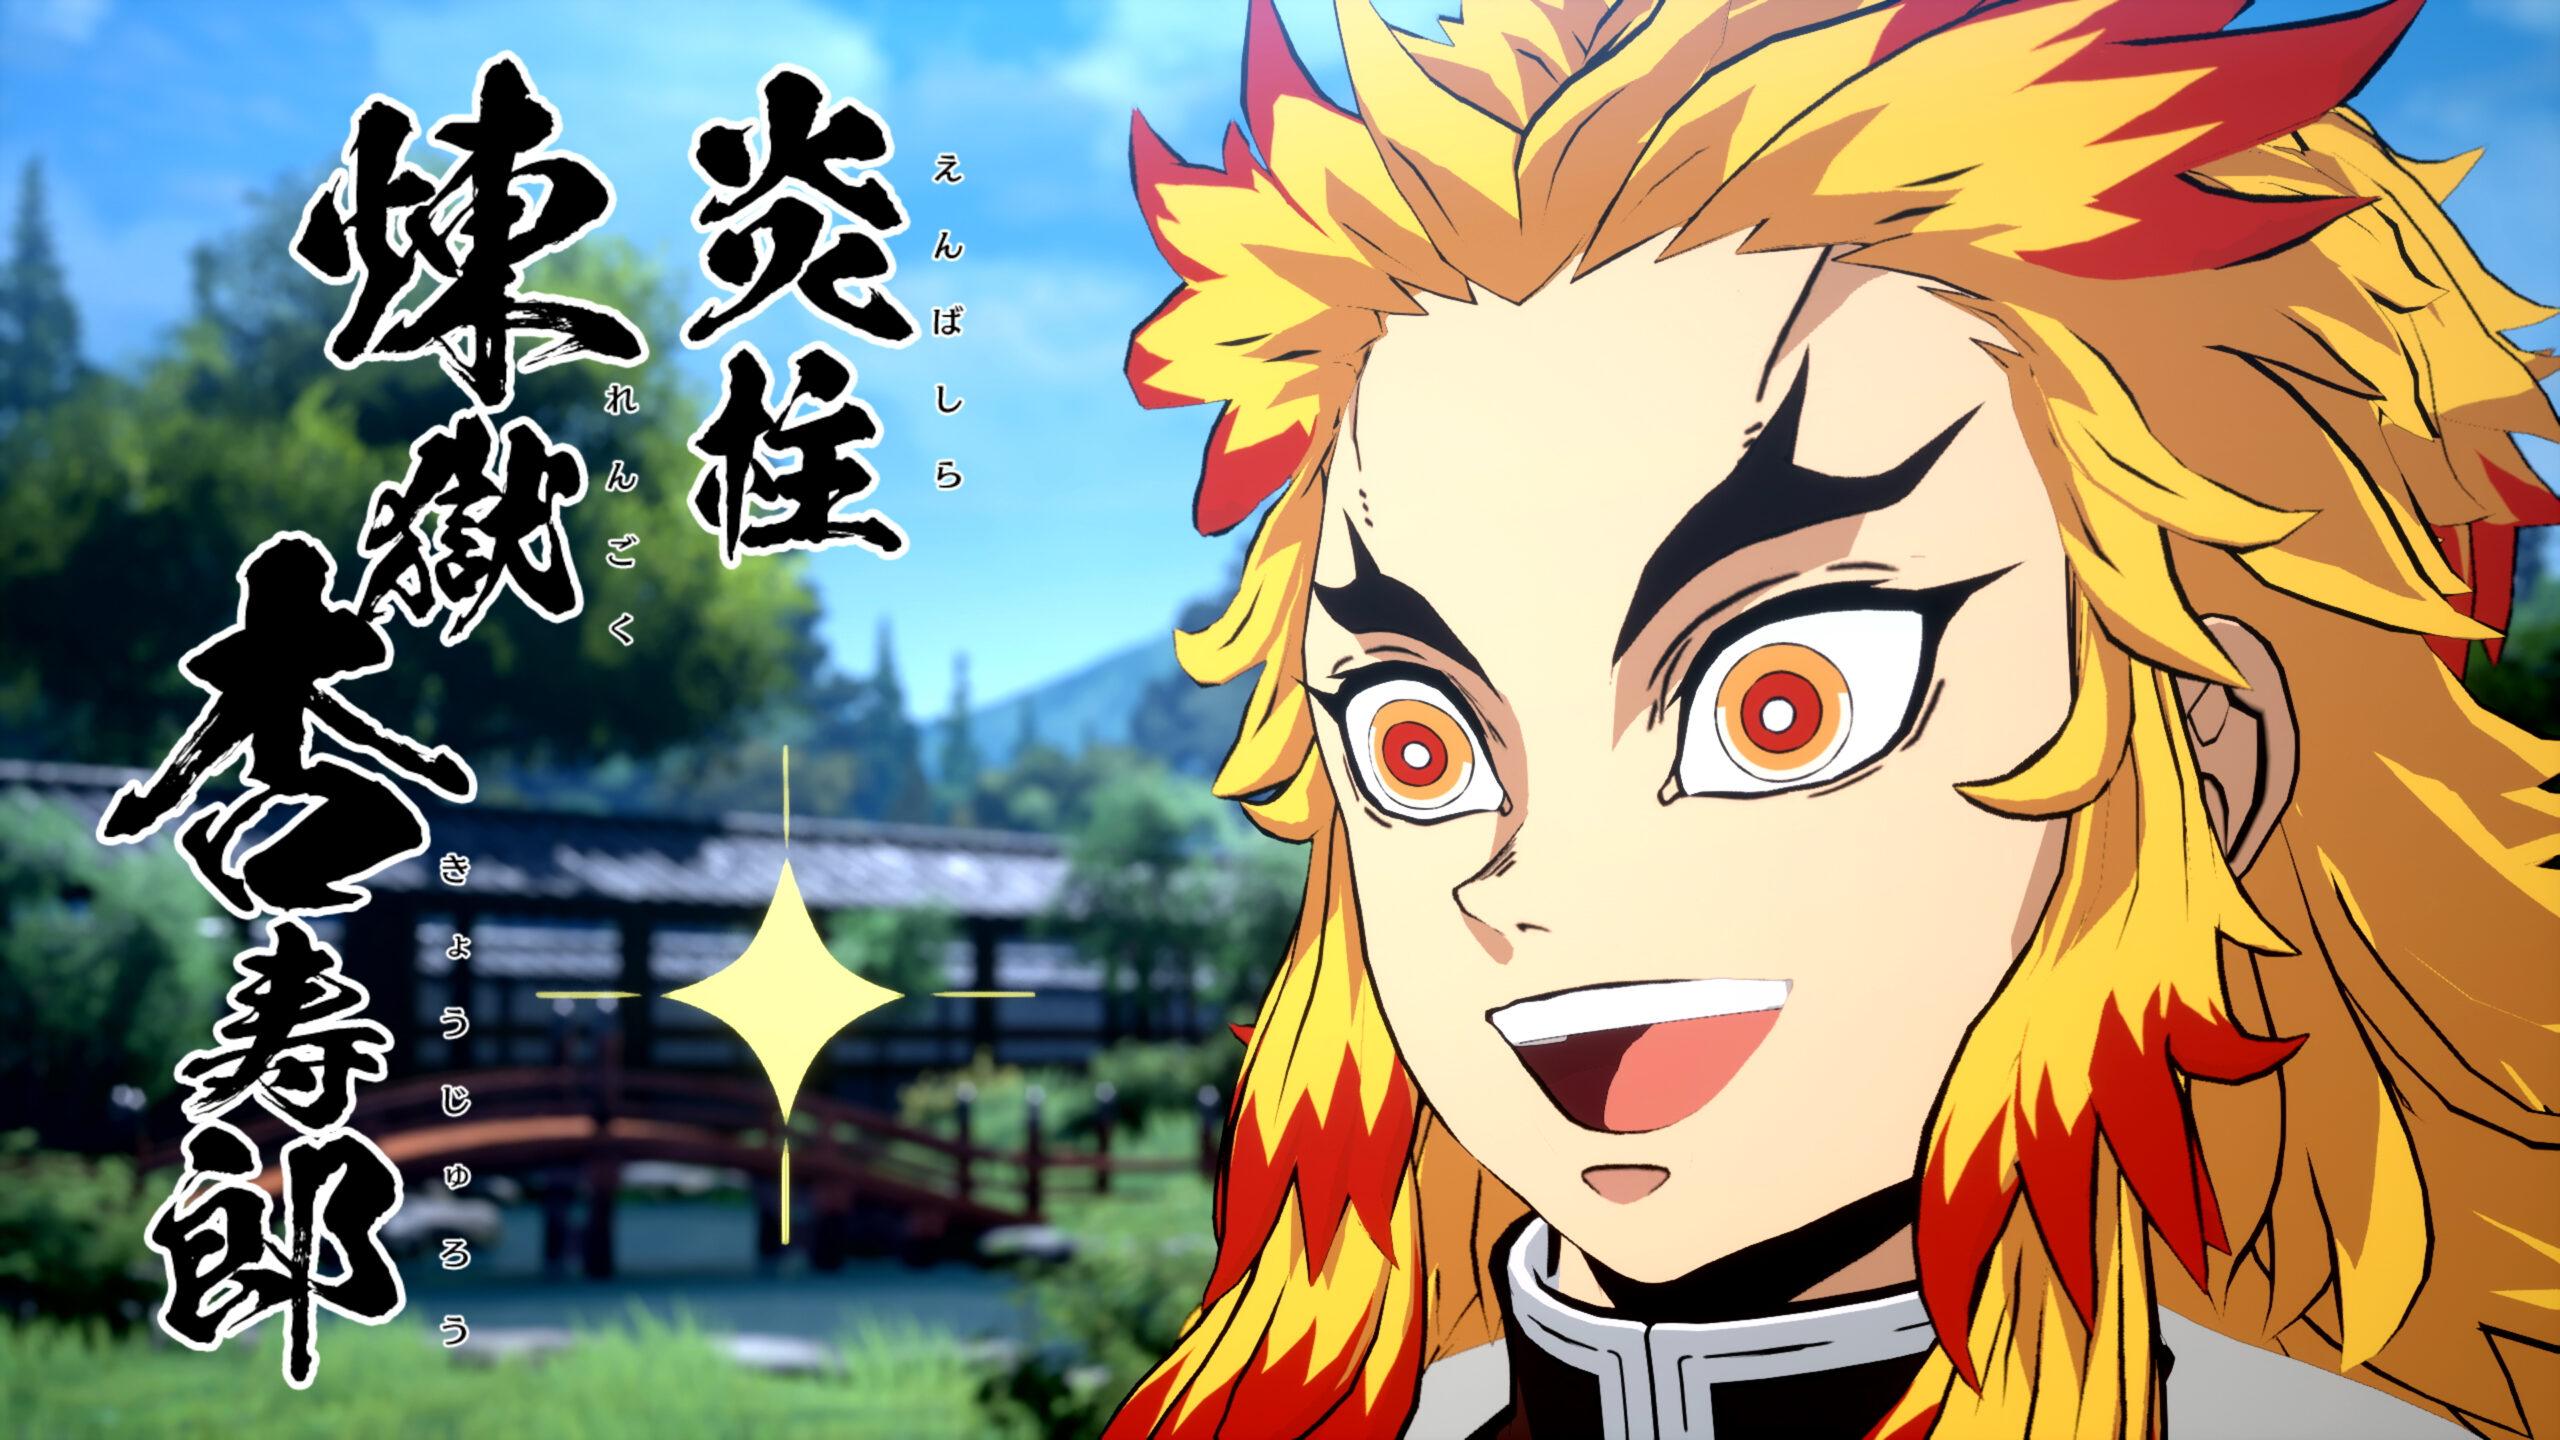 Demon Slayer Kimetsu no Yaiba The Hinokami Chronicles 2021 09 10 21 004 scaled